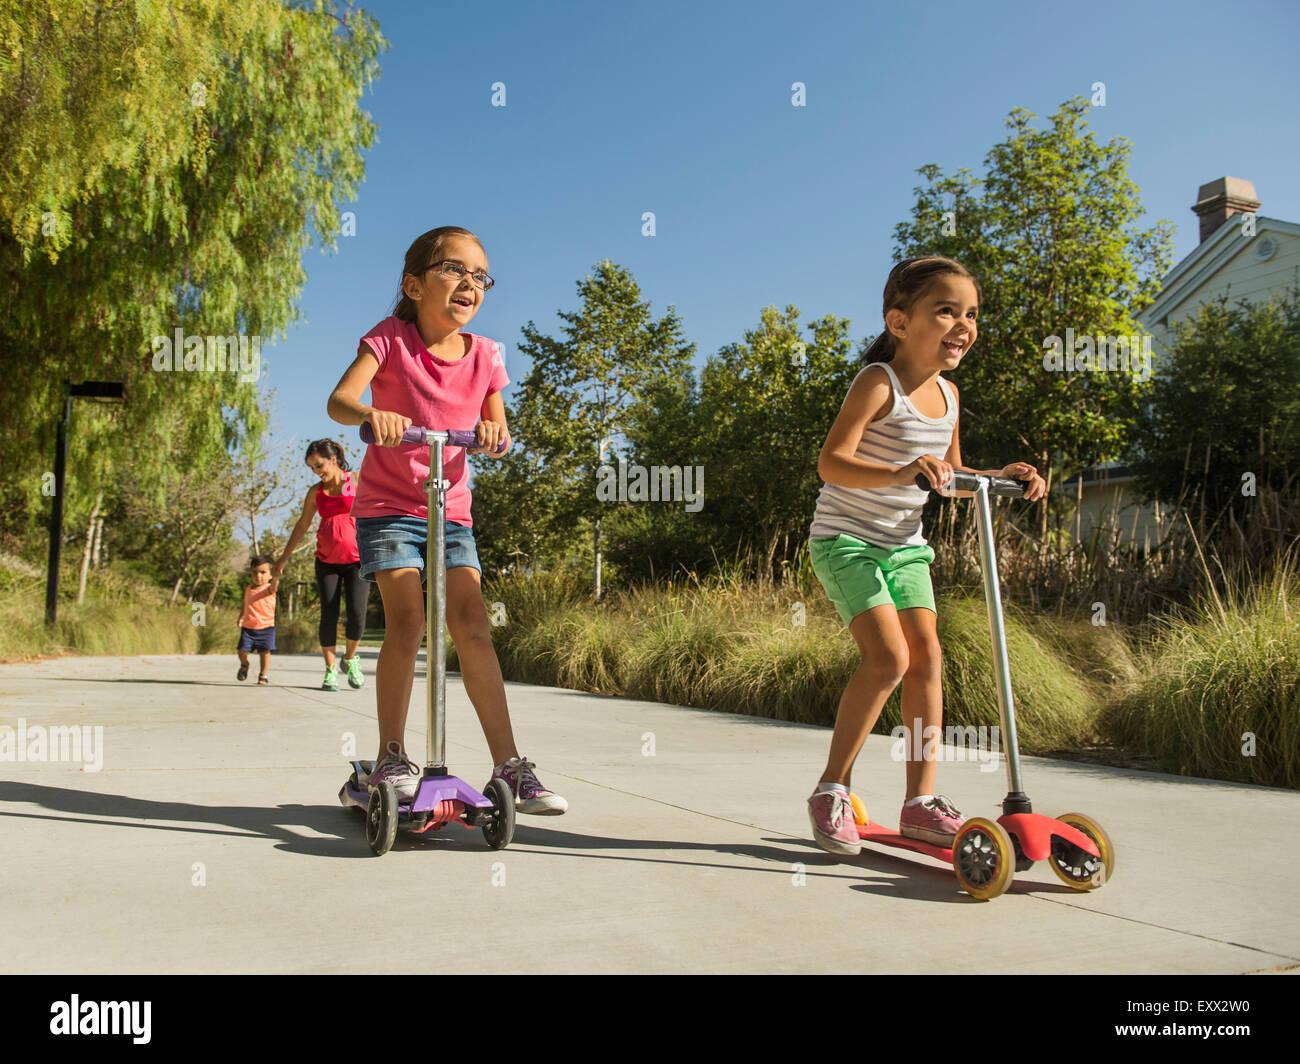 80681da3b5c South America Children Stock Photos & South America Children Stock ...